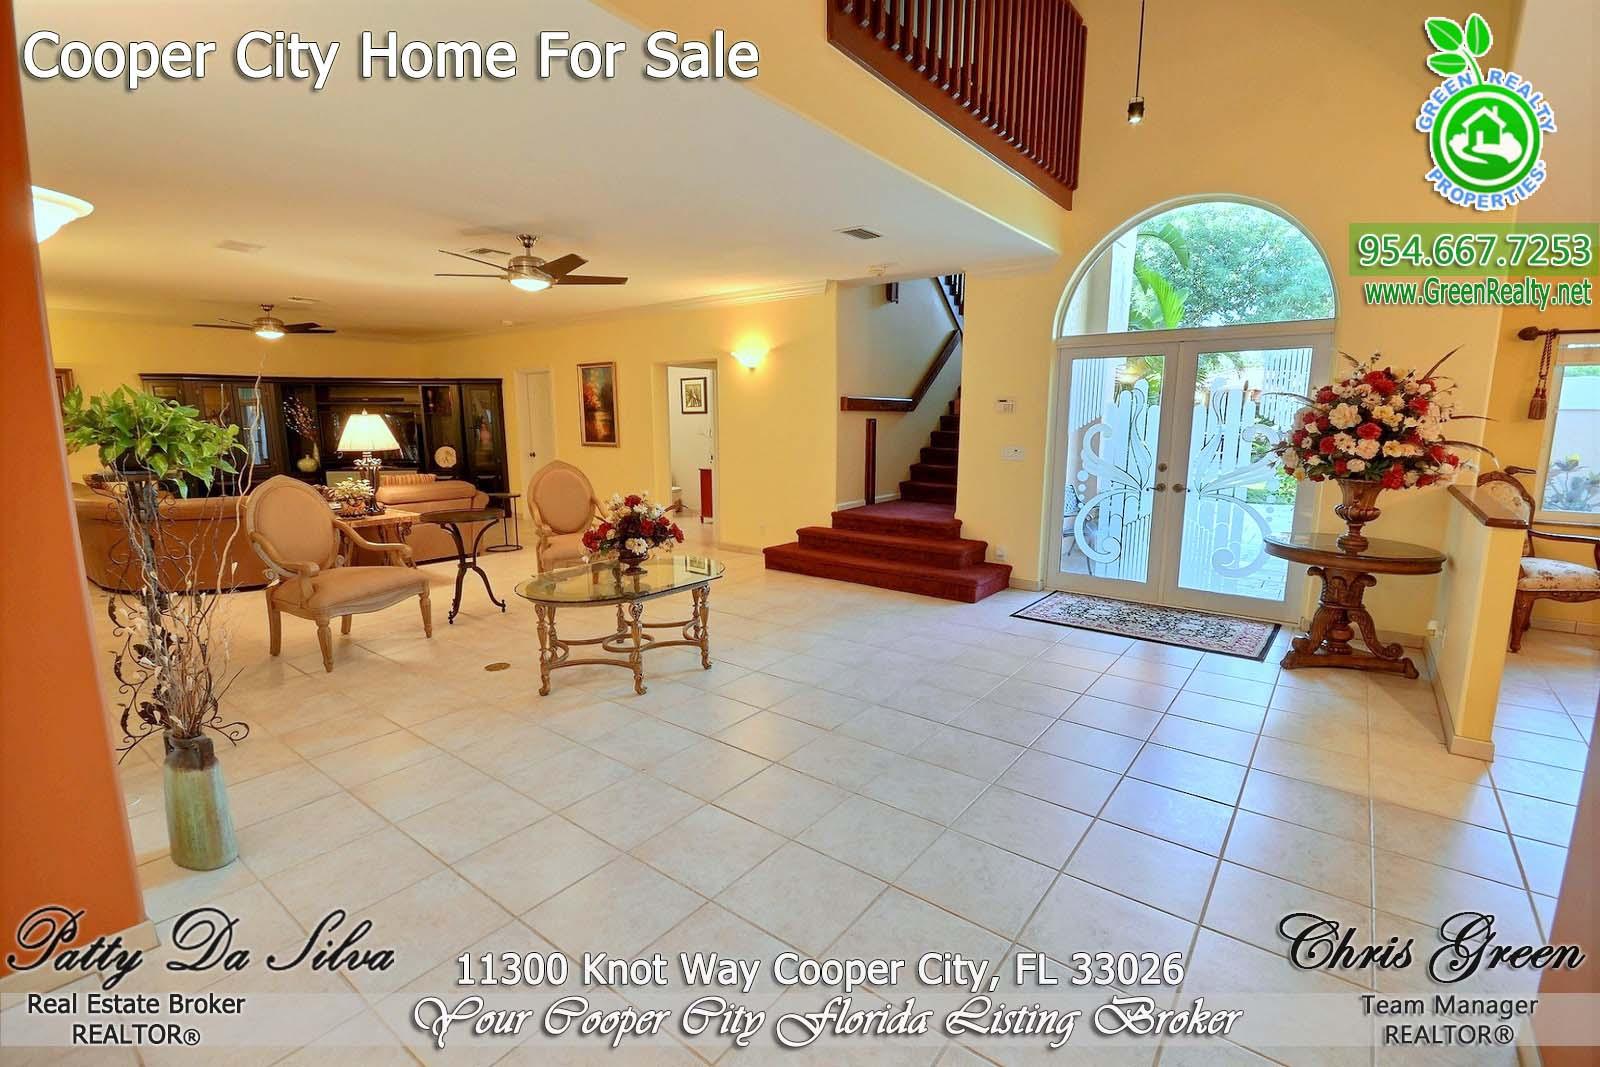 11 Rock Creek Cooper City Homes For Sale (5)